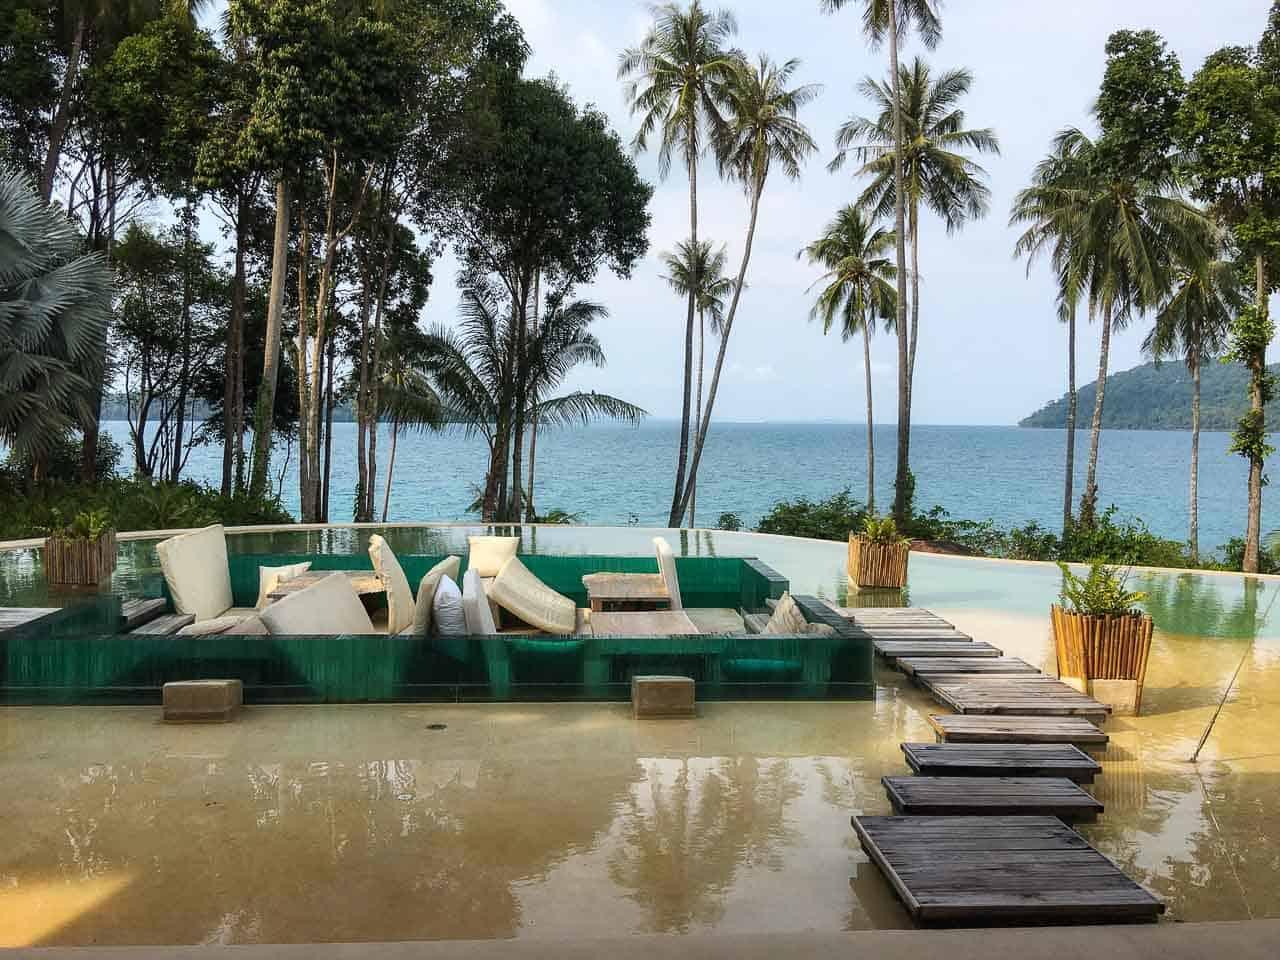 pool at Thailand resort Soneva Kiri